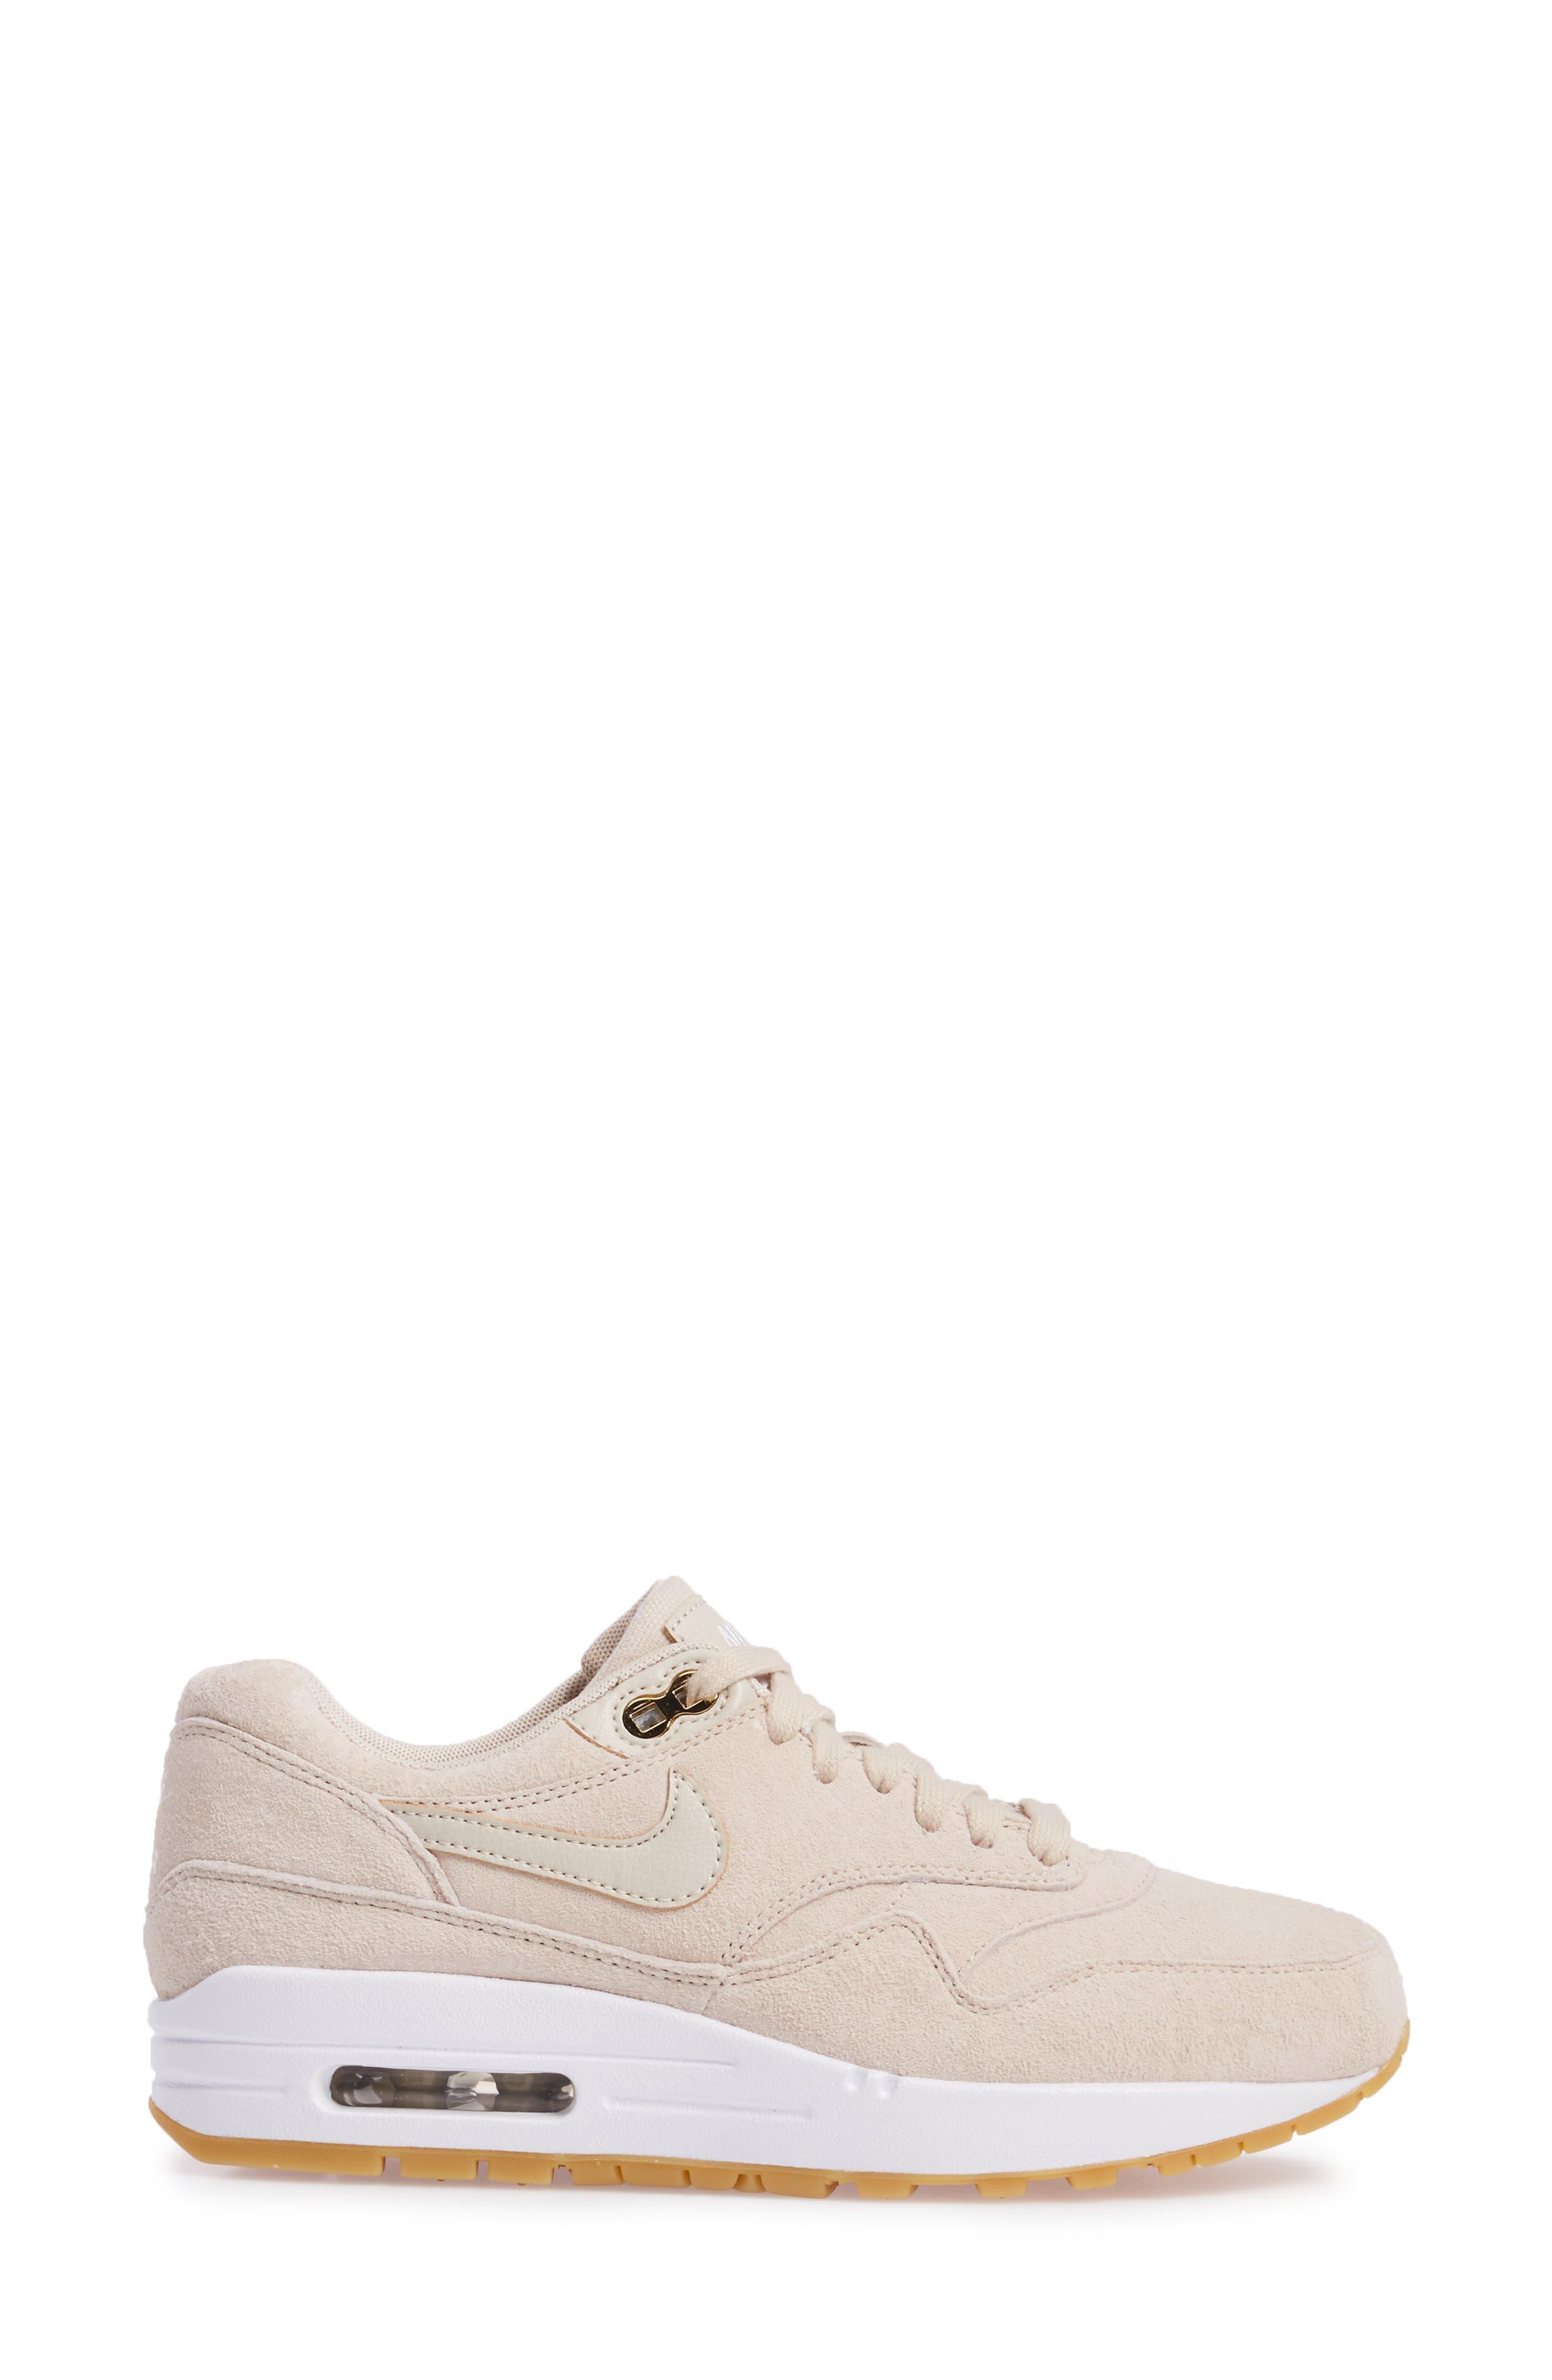 Air Max 1 SD Sneaker,                             Alternate thumbnail 3, color,                             250